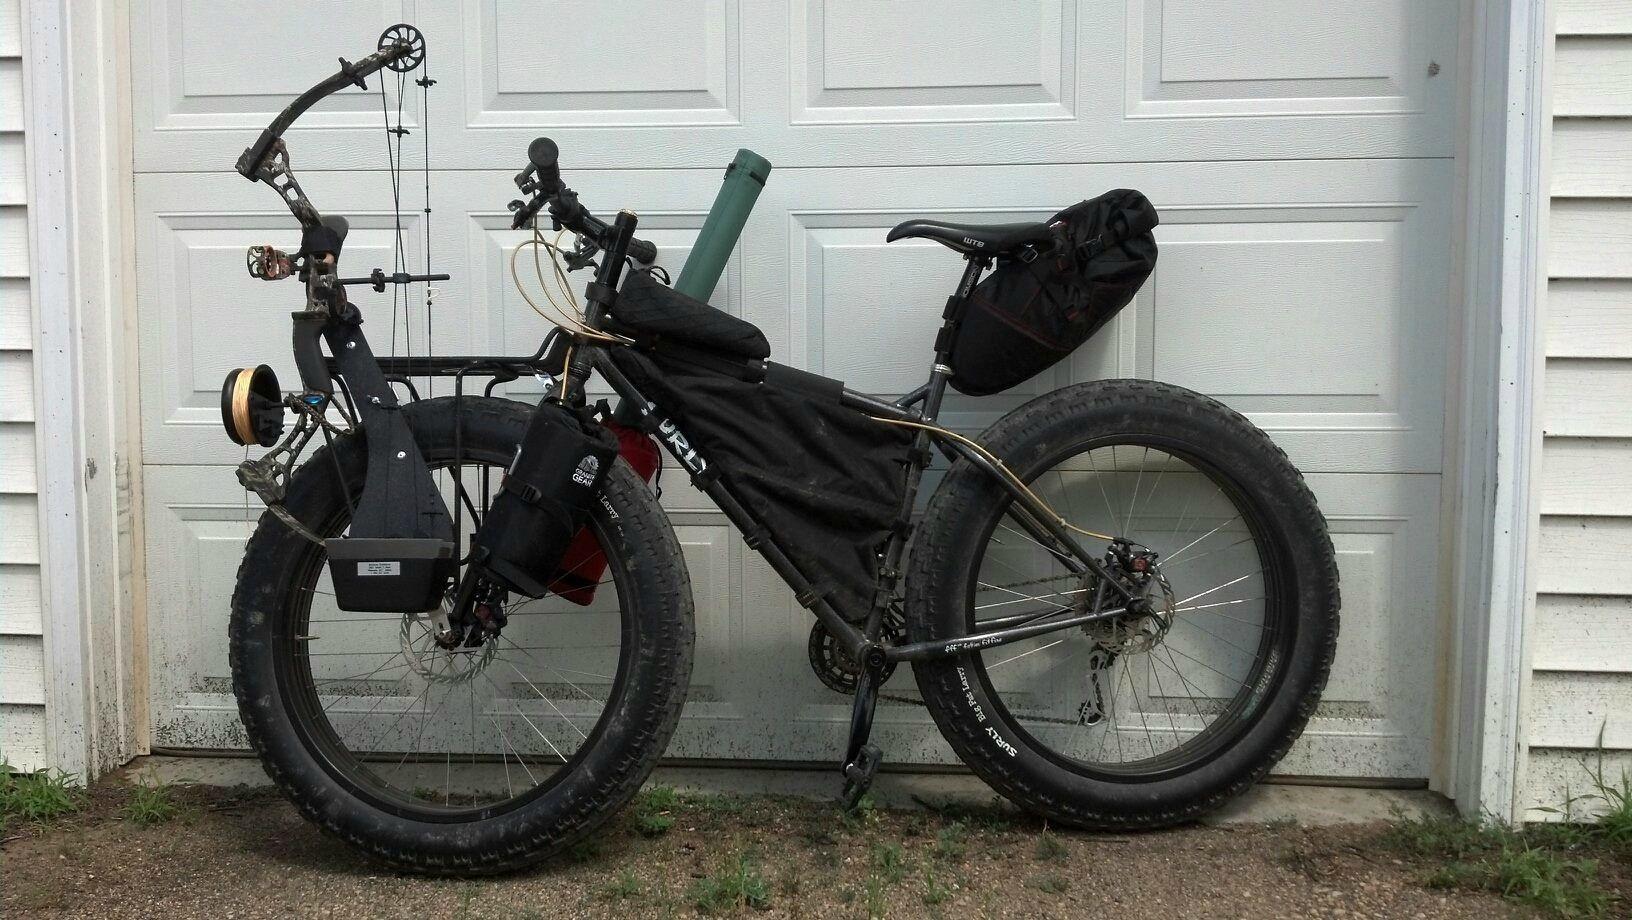 Pin On Bikepacking With A Fat Bike